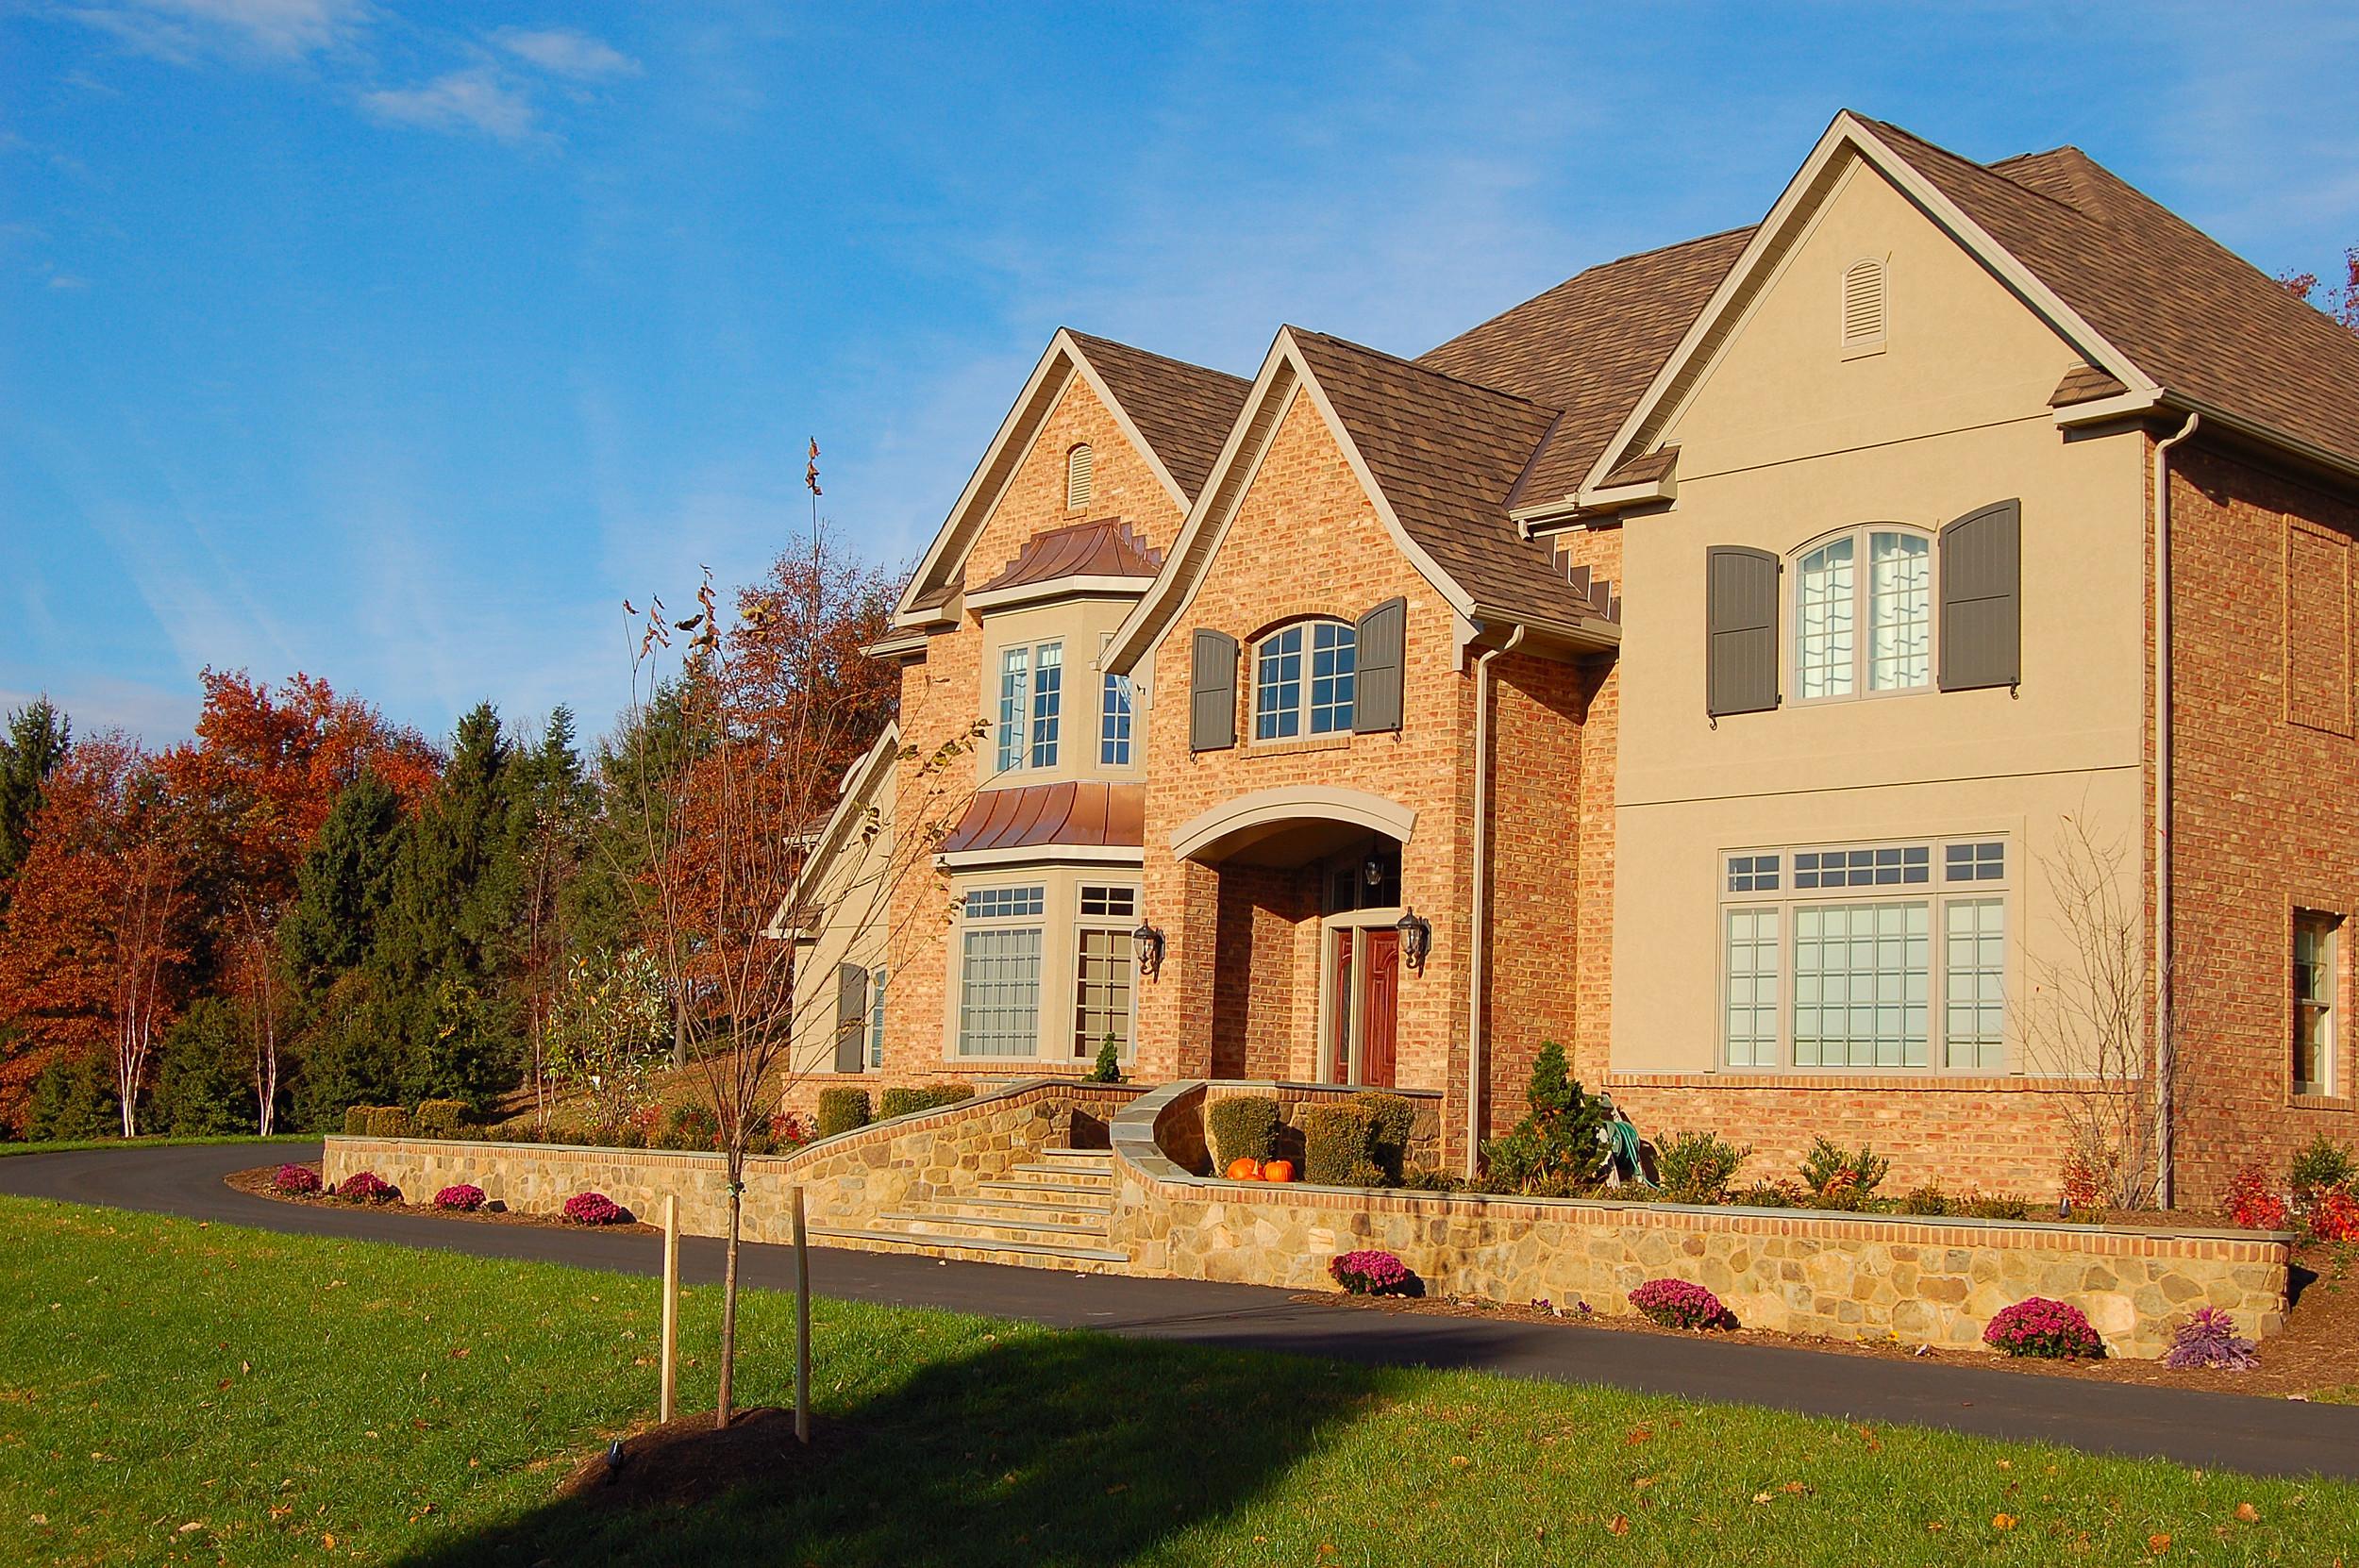 Residential landscape design in York, PA